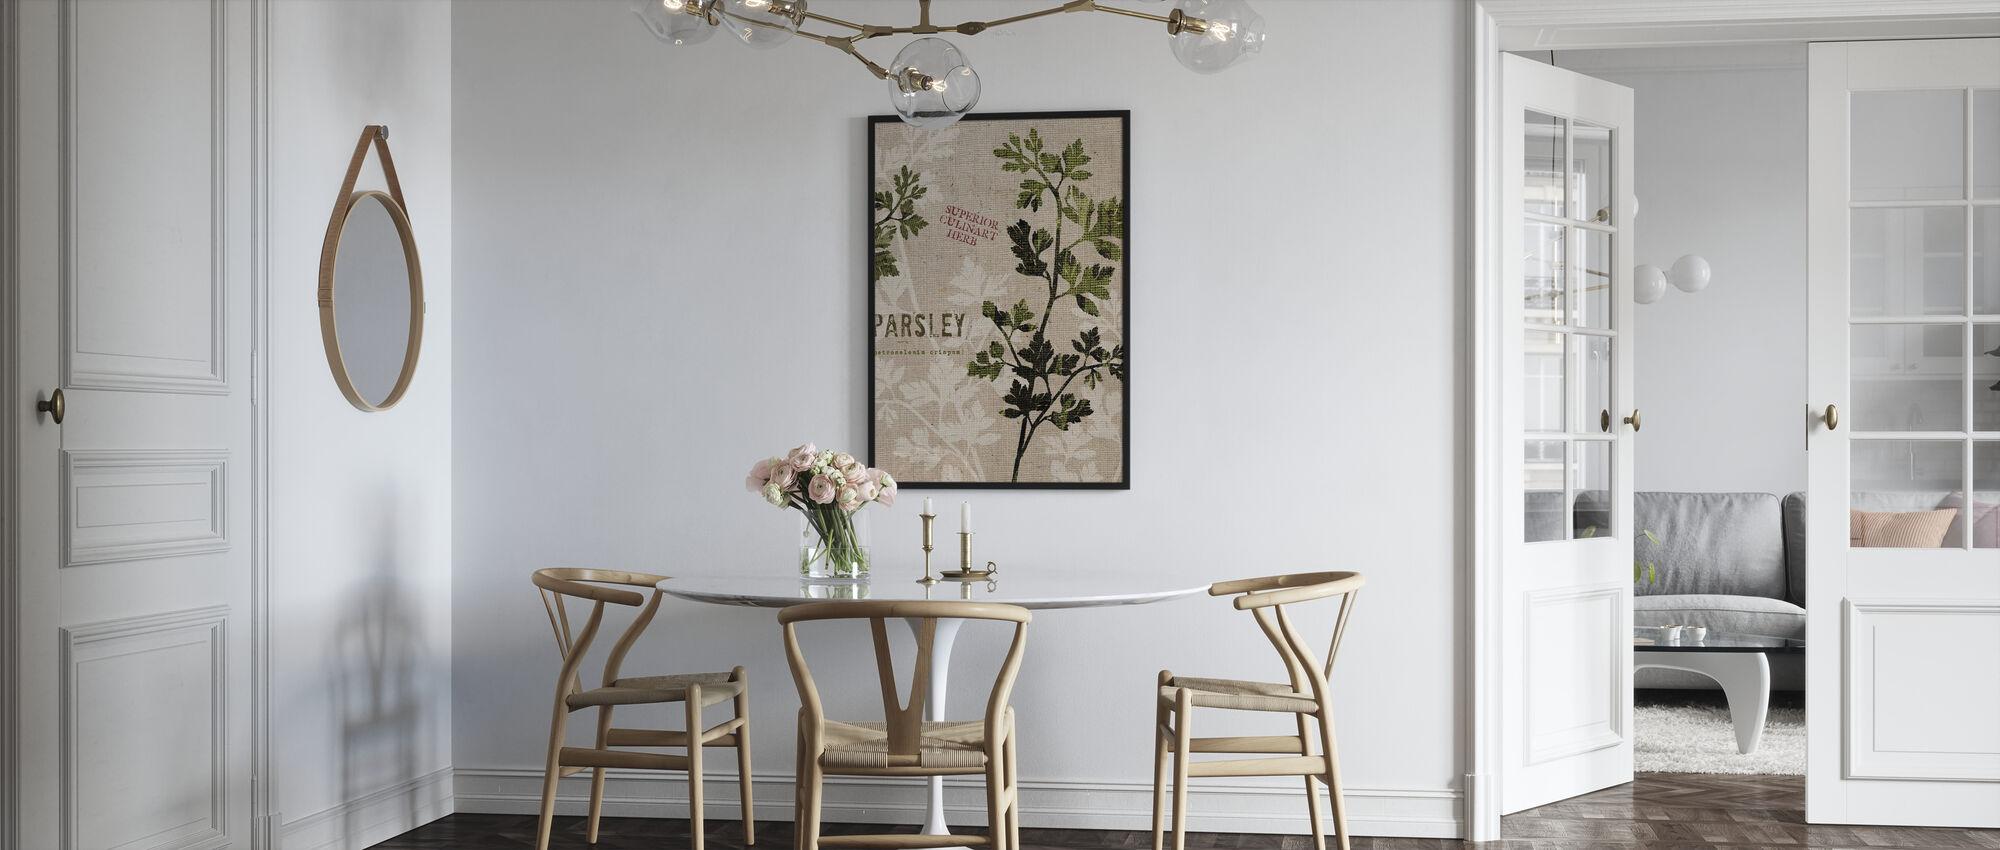 Organic Parsley - Framed print - Kitchen